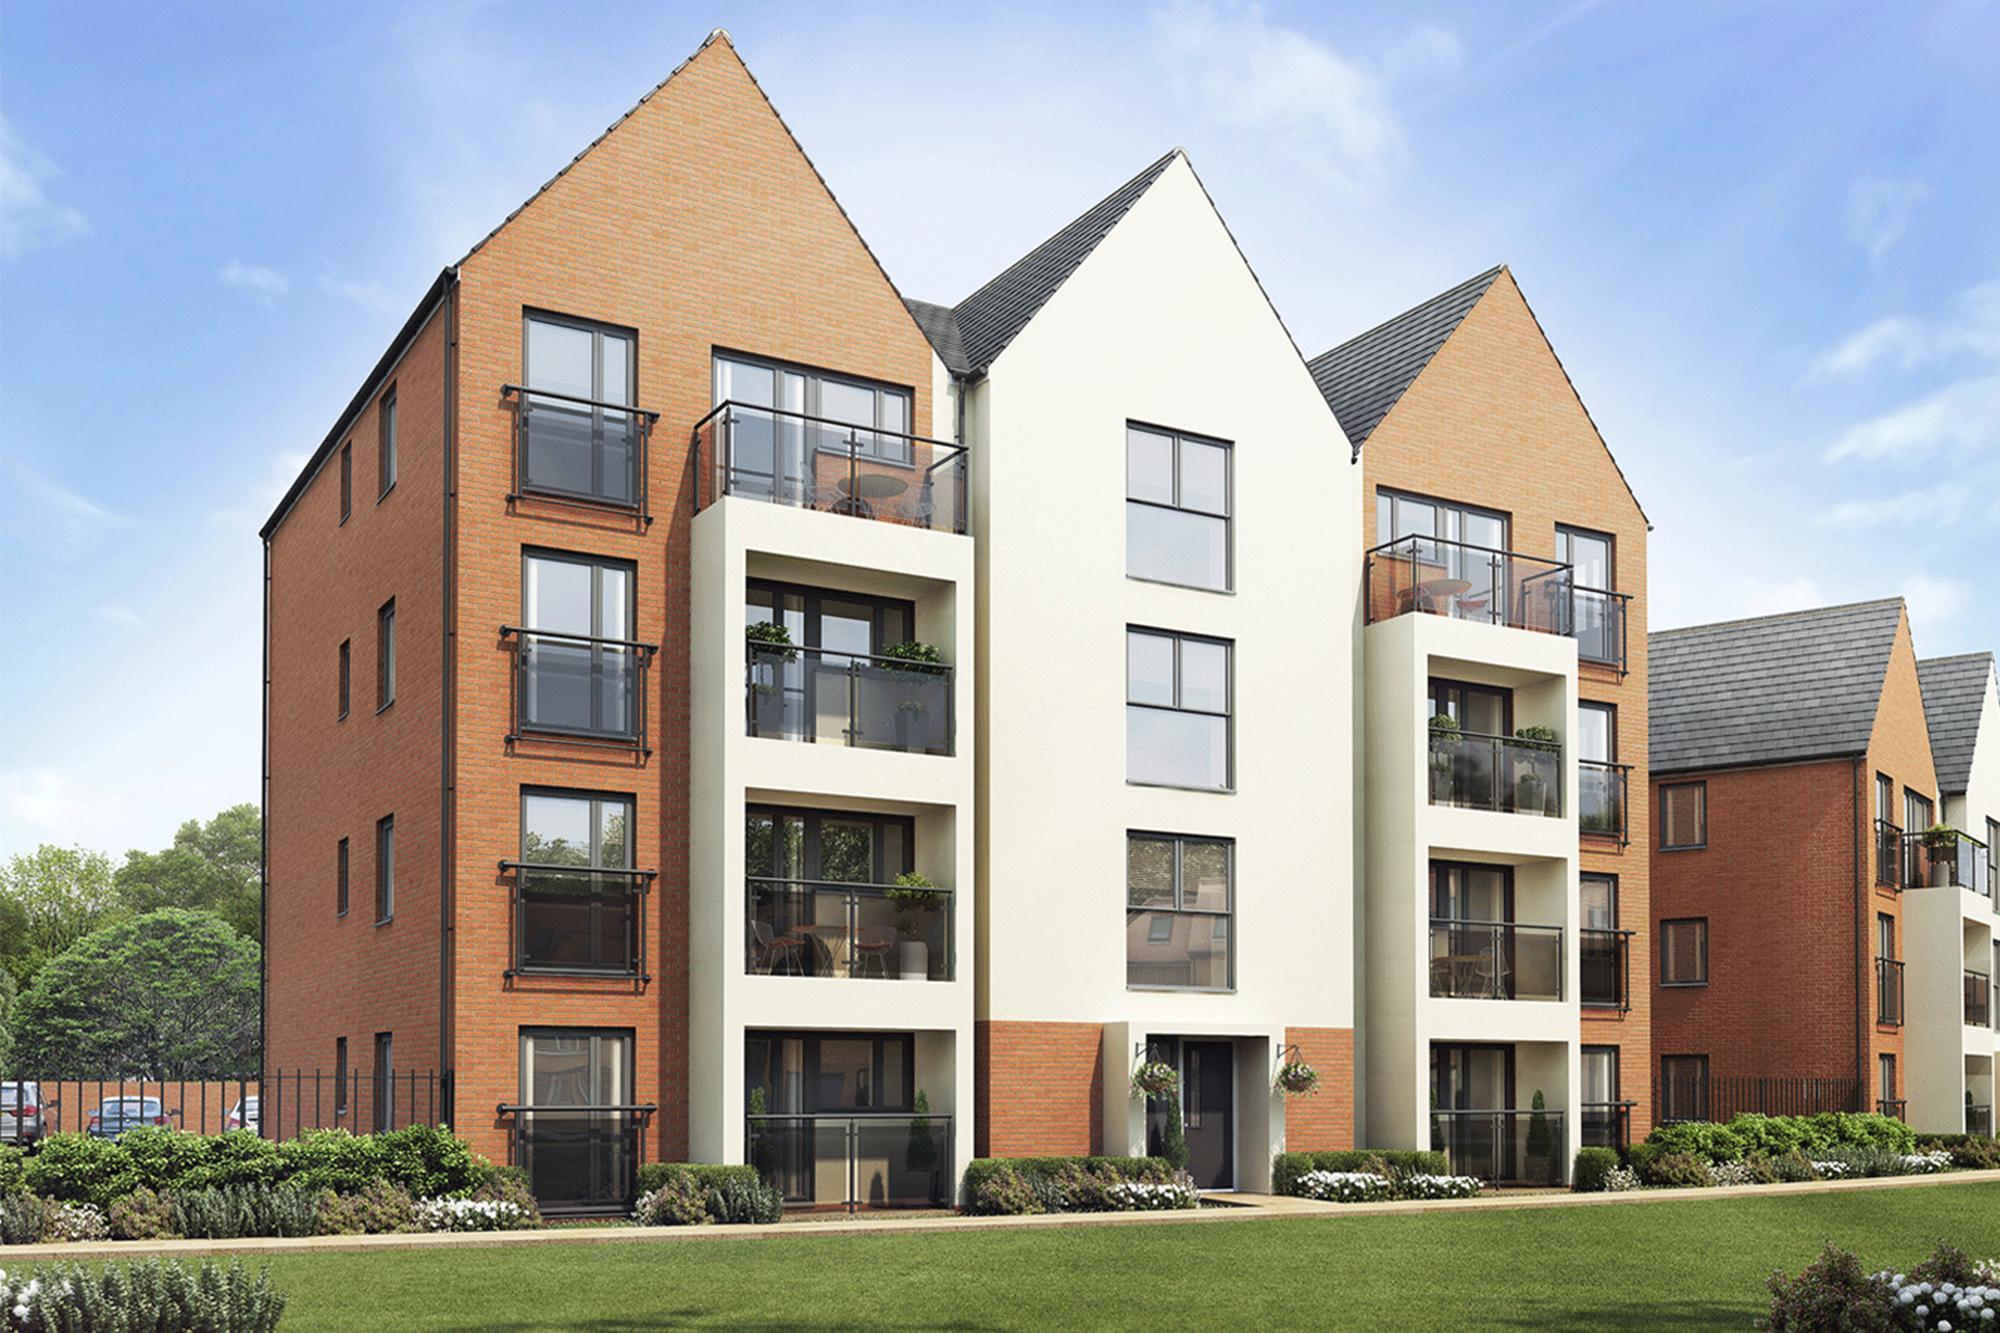 New Build Homes at Rosemoor in in MILTON KEYNES